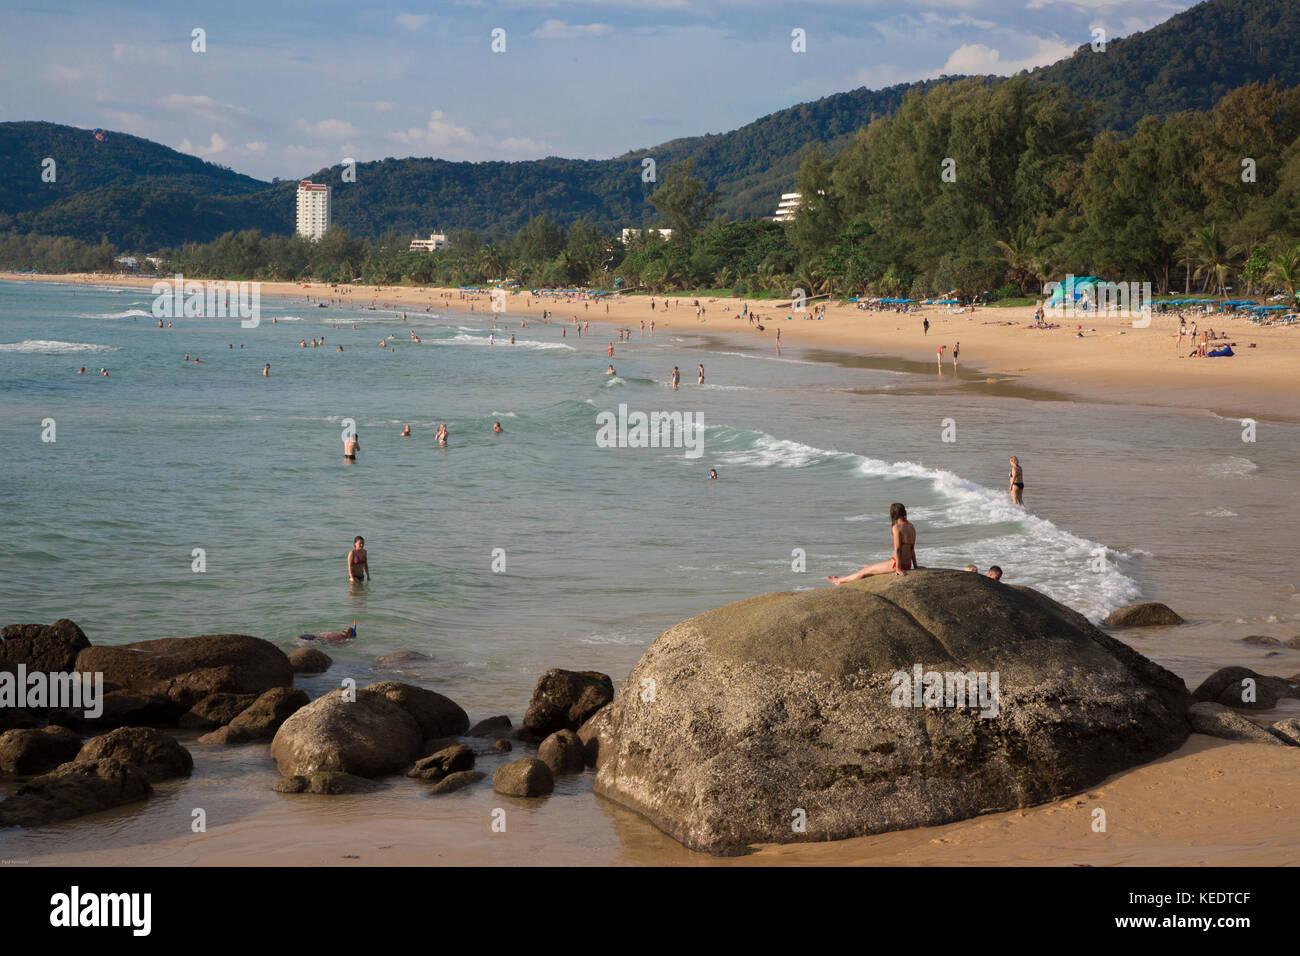 Tourists swimming and relaxing on Karon Beach, Phuket Island, Thailand - Stock Image